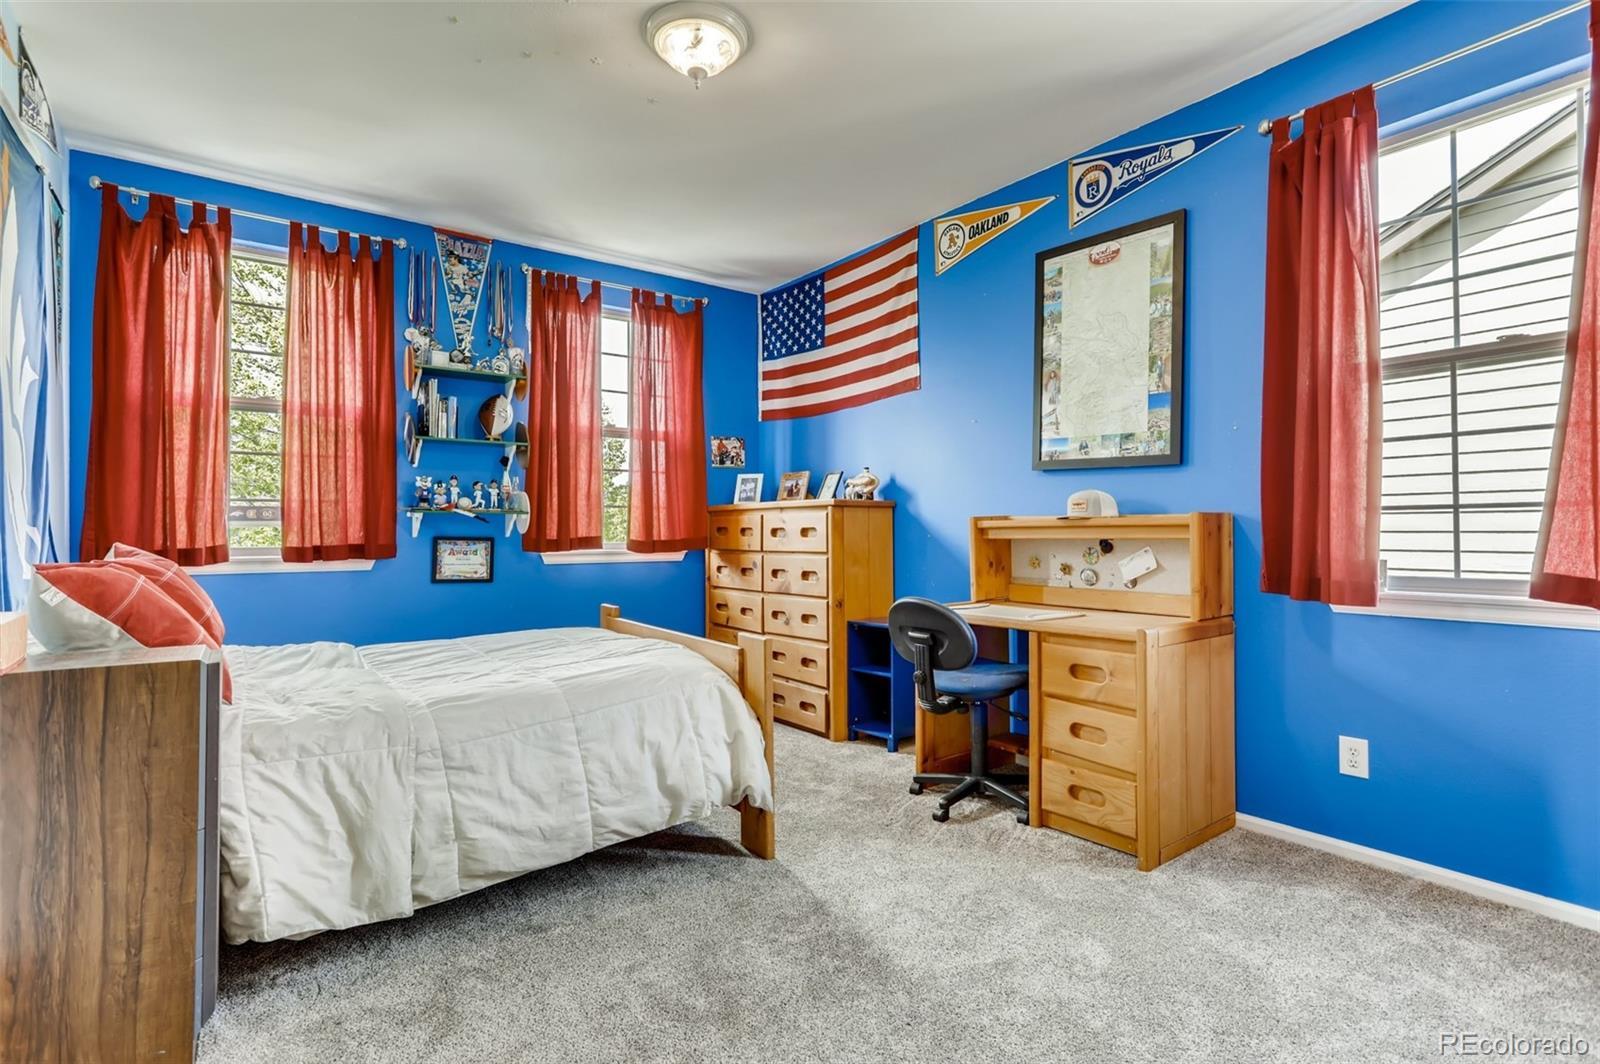 MLS# 5875939 - 25 - 7334 E Cedar Avenue, Denver, CO 80230